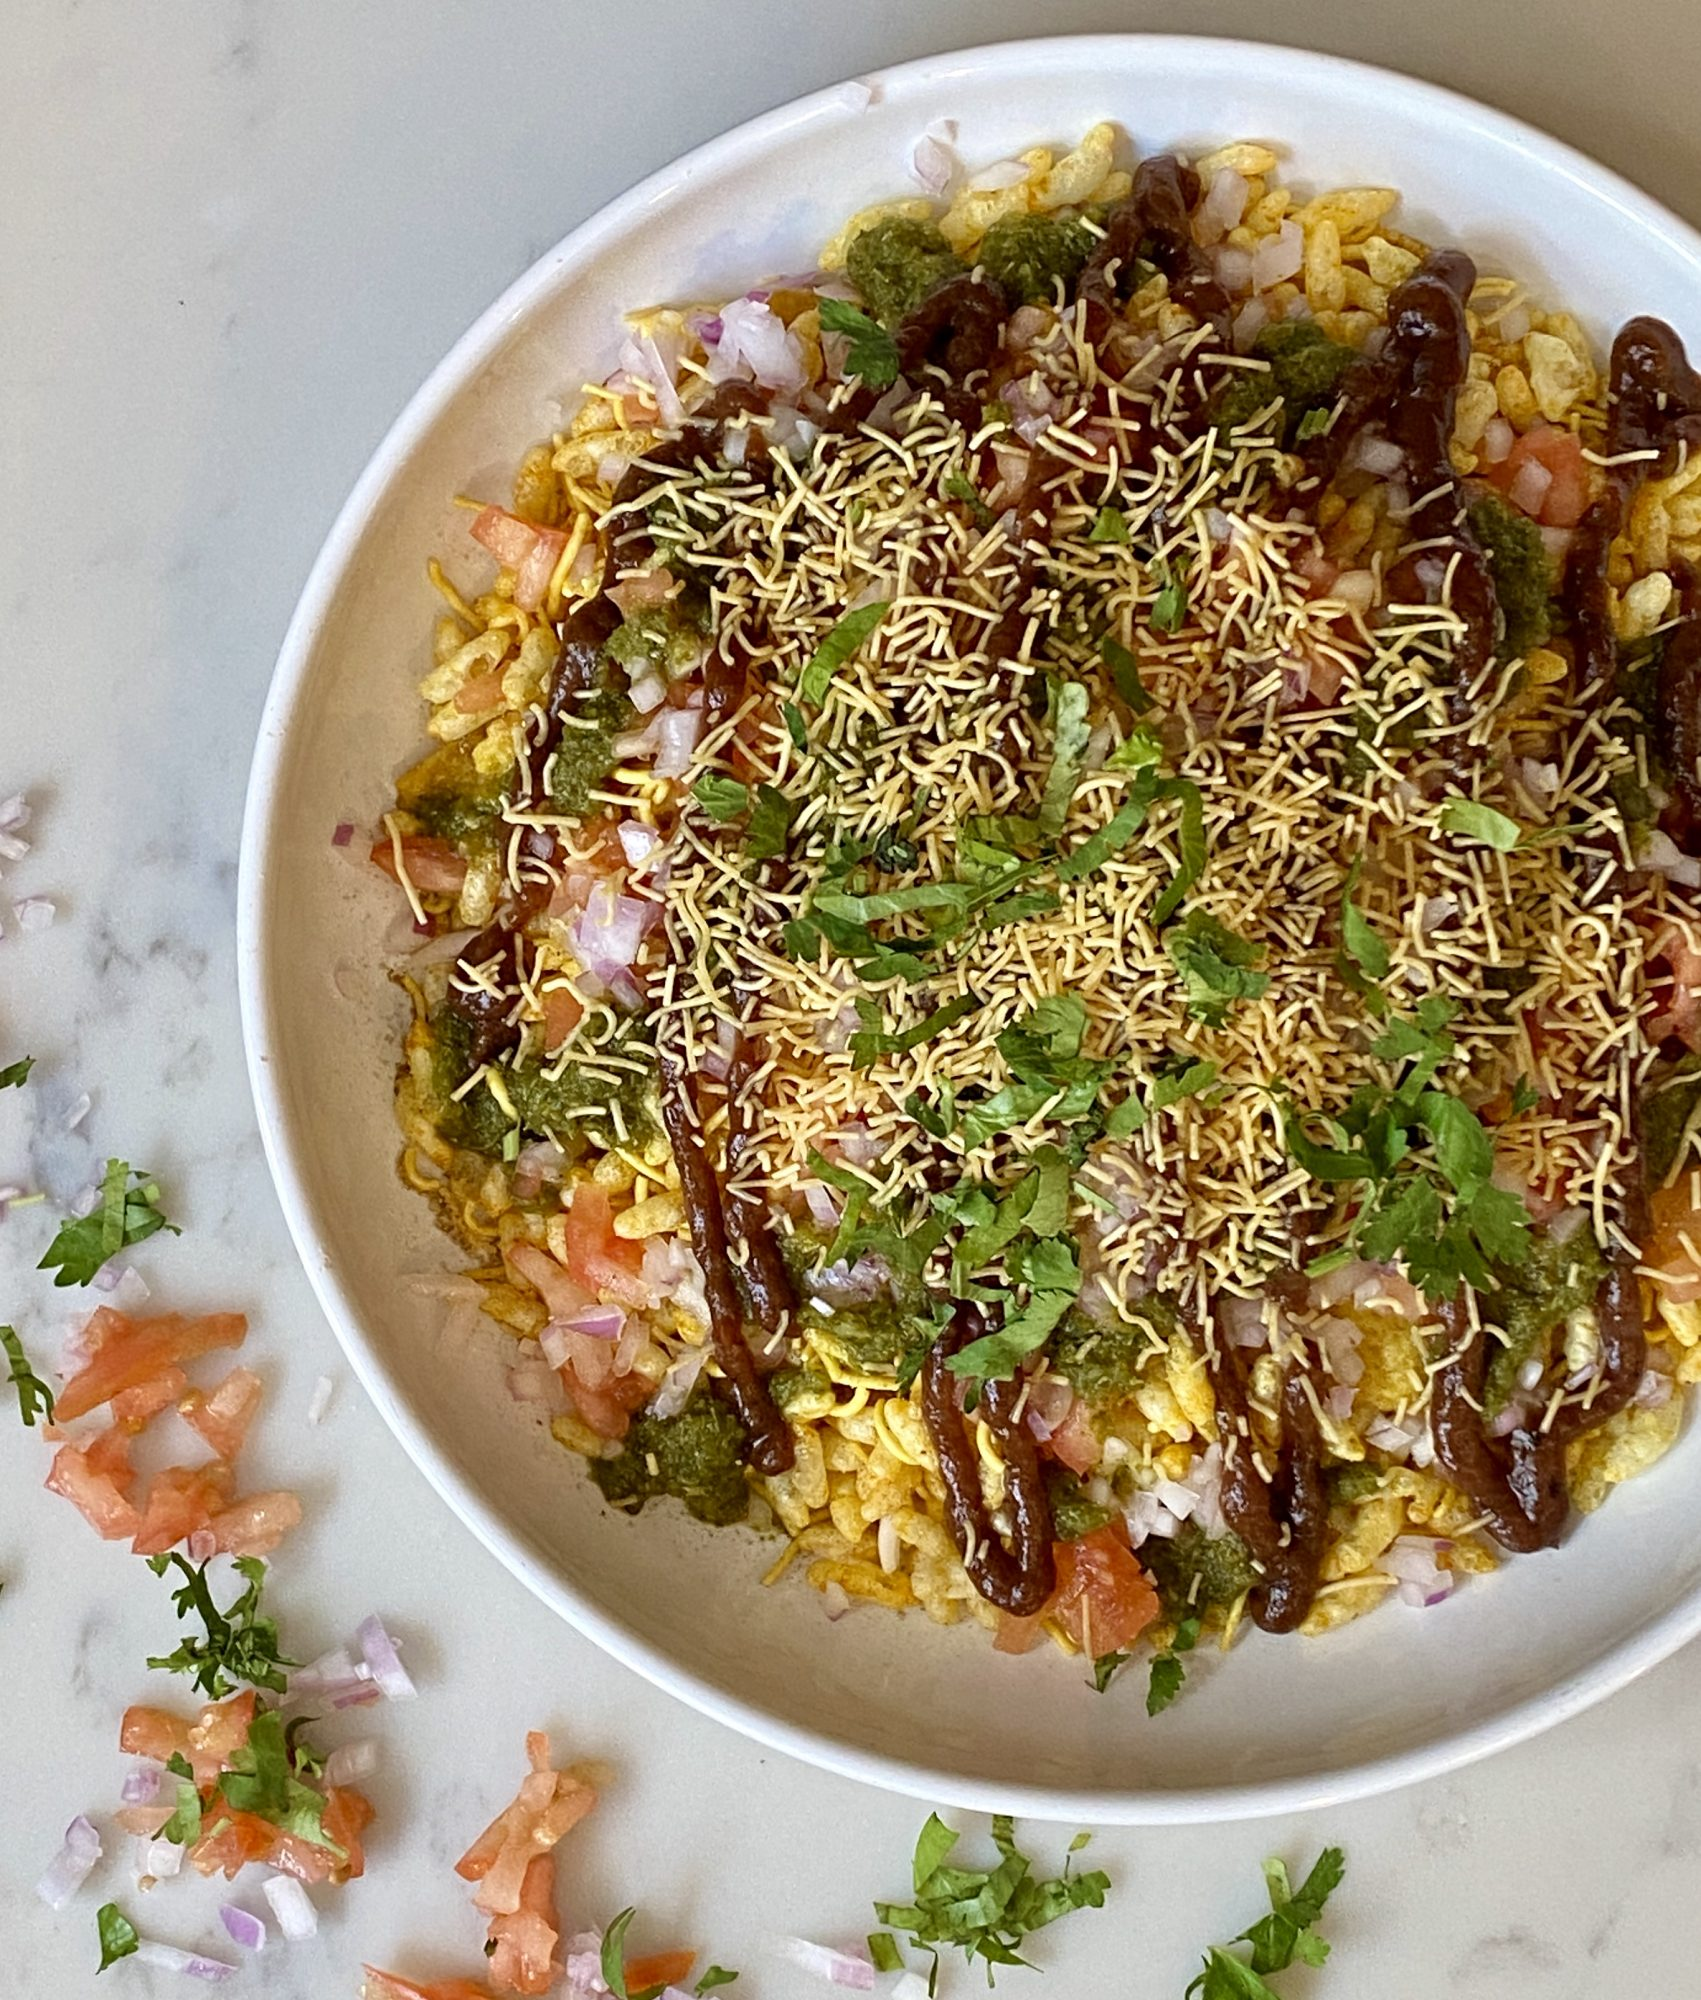 Bhel Puri DG Pantry Meal Kit